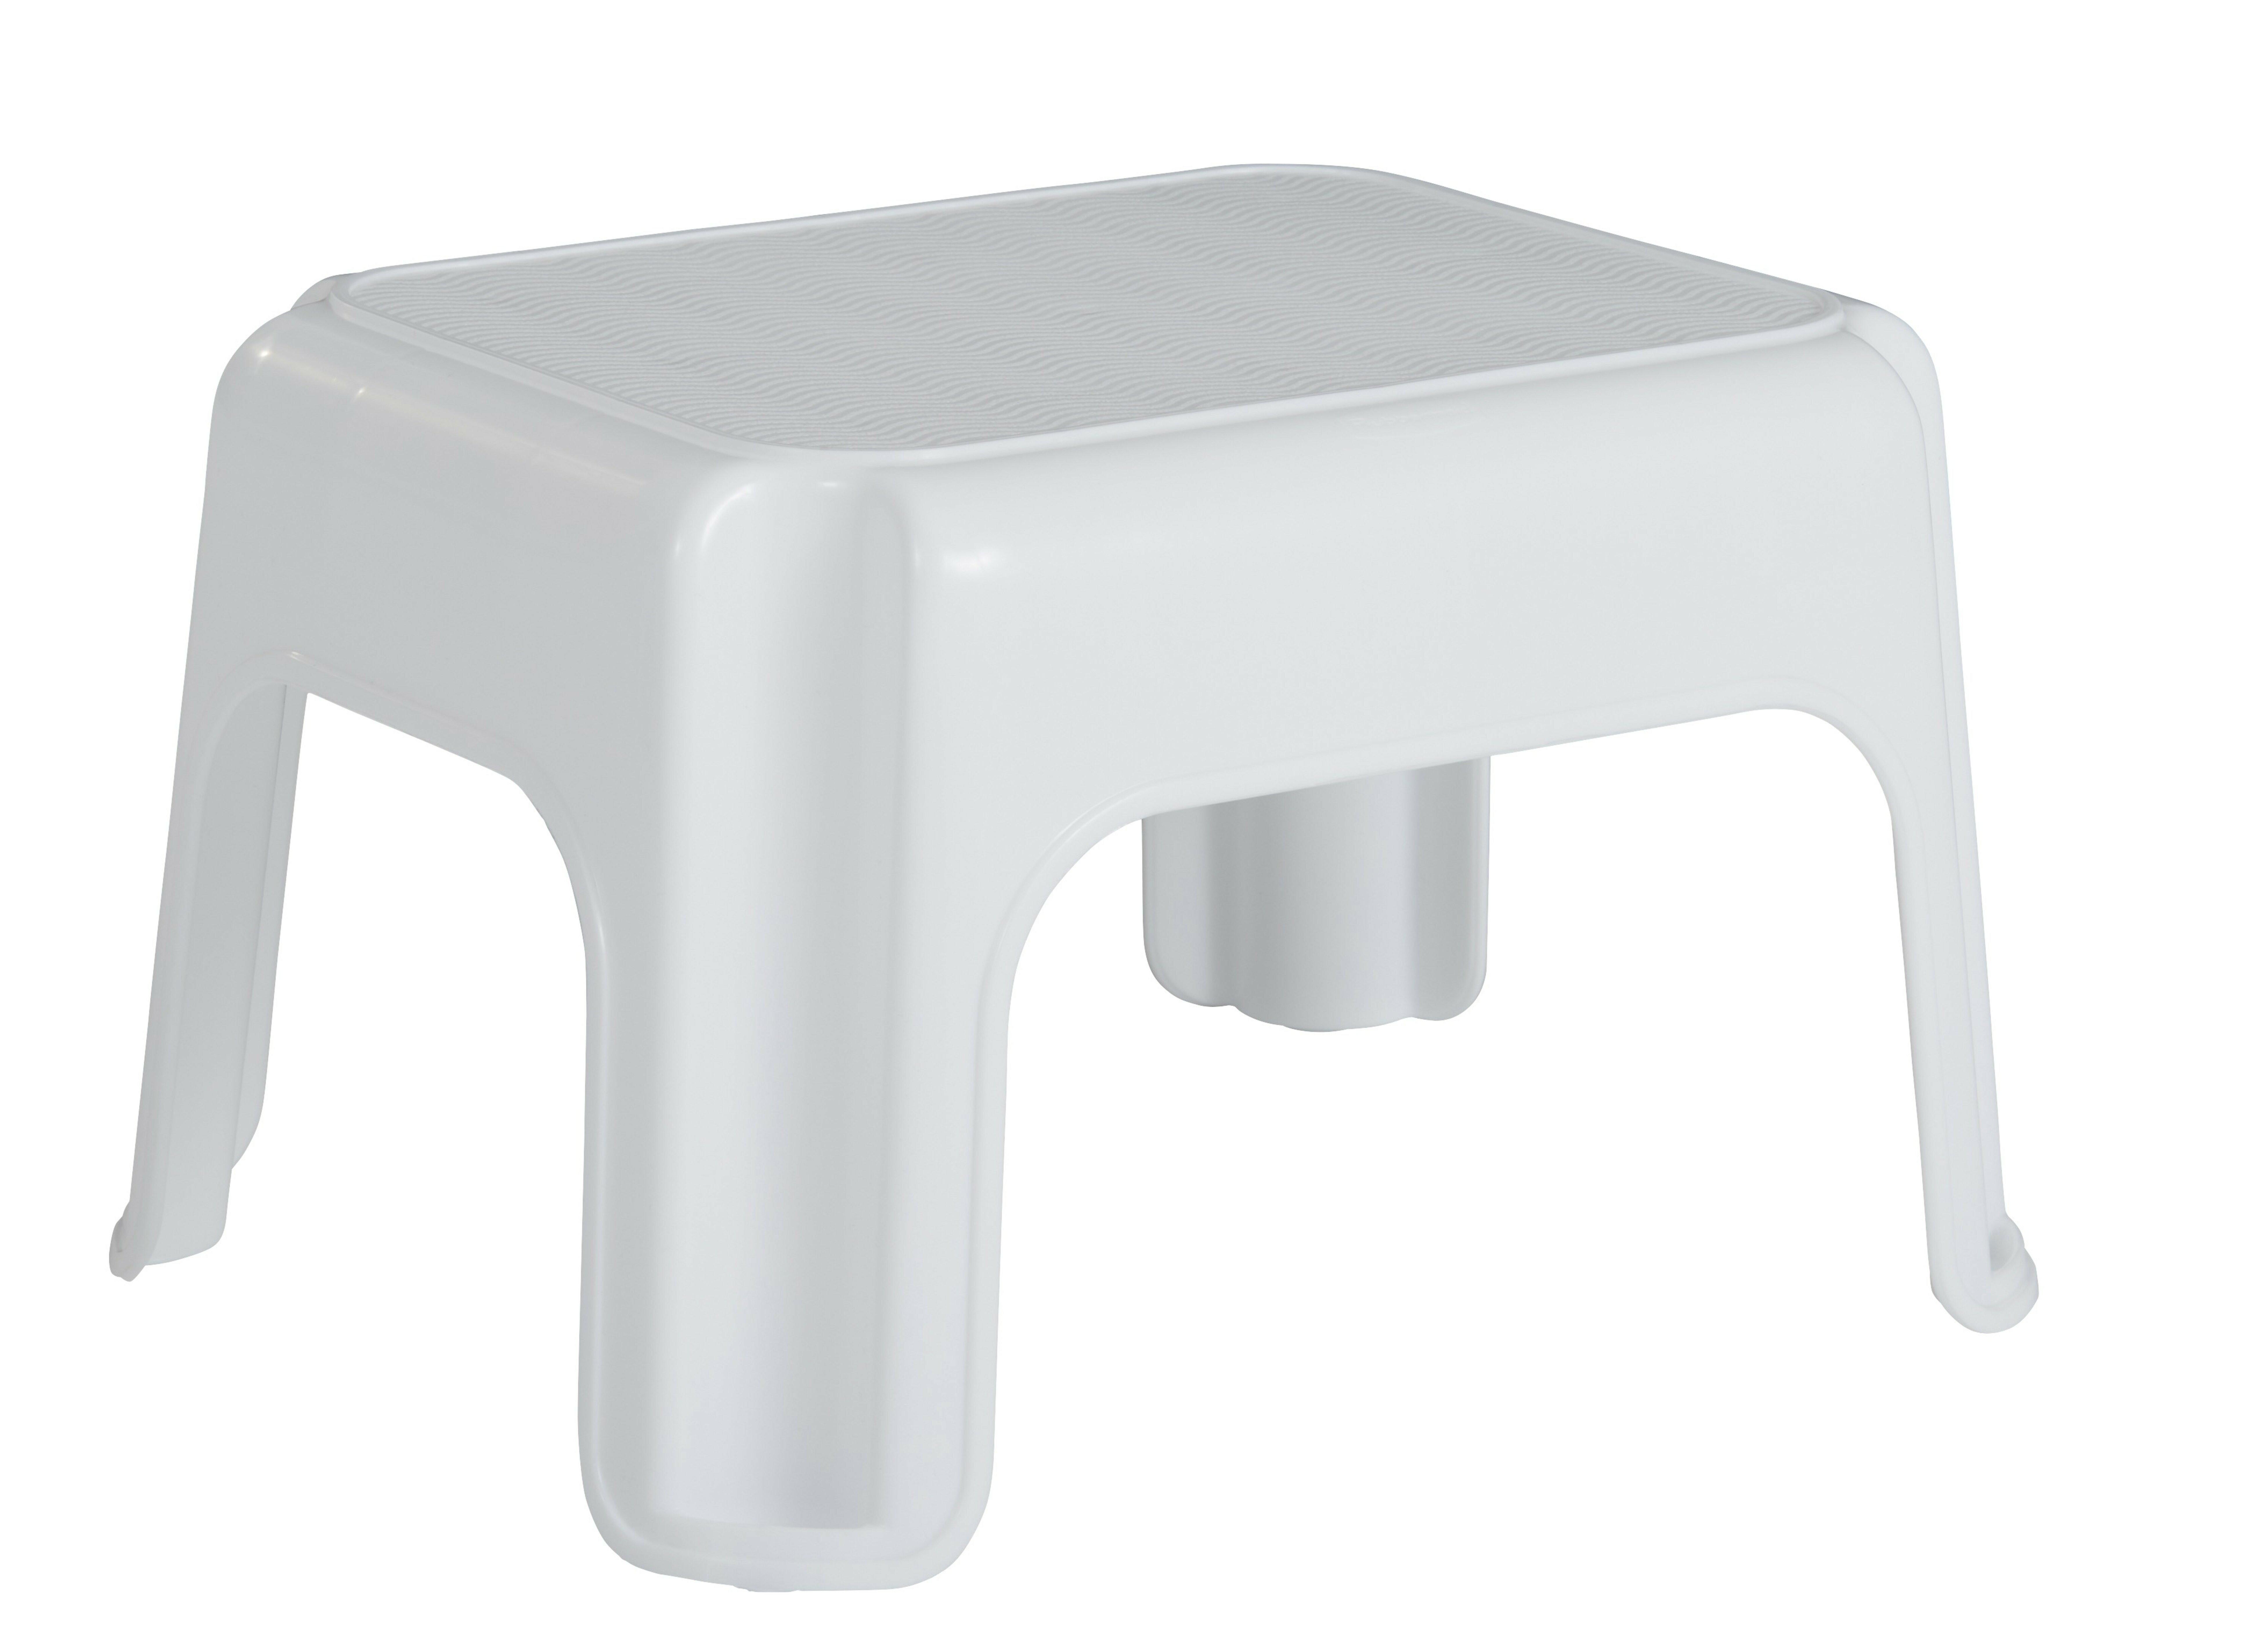 Rubbermaid 1 Step Plastic Step Stool With 300 Lb Load Capacity Wayfair